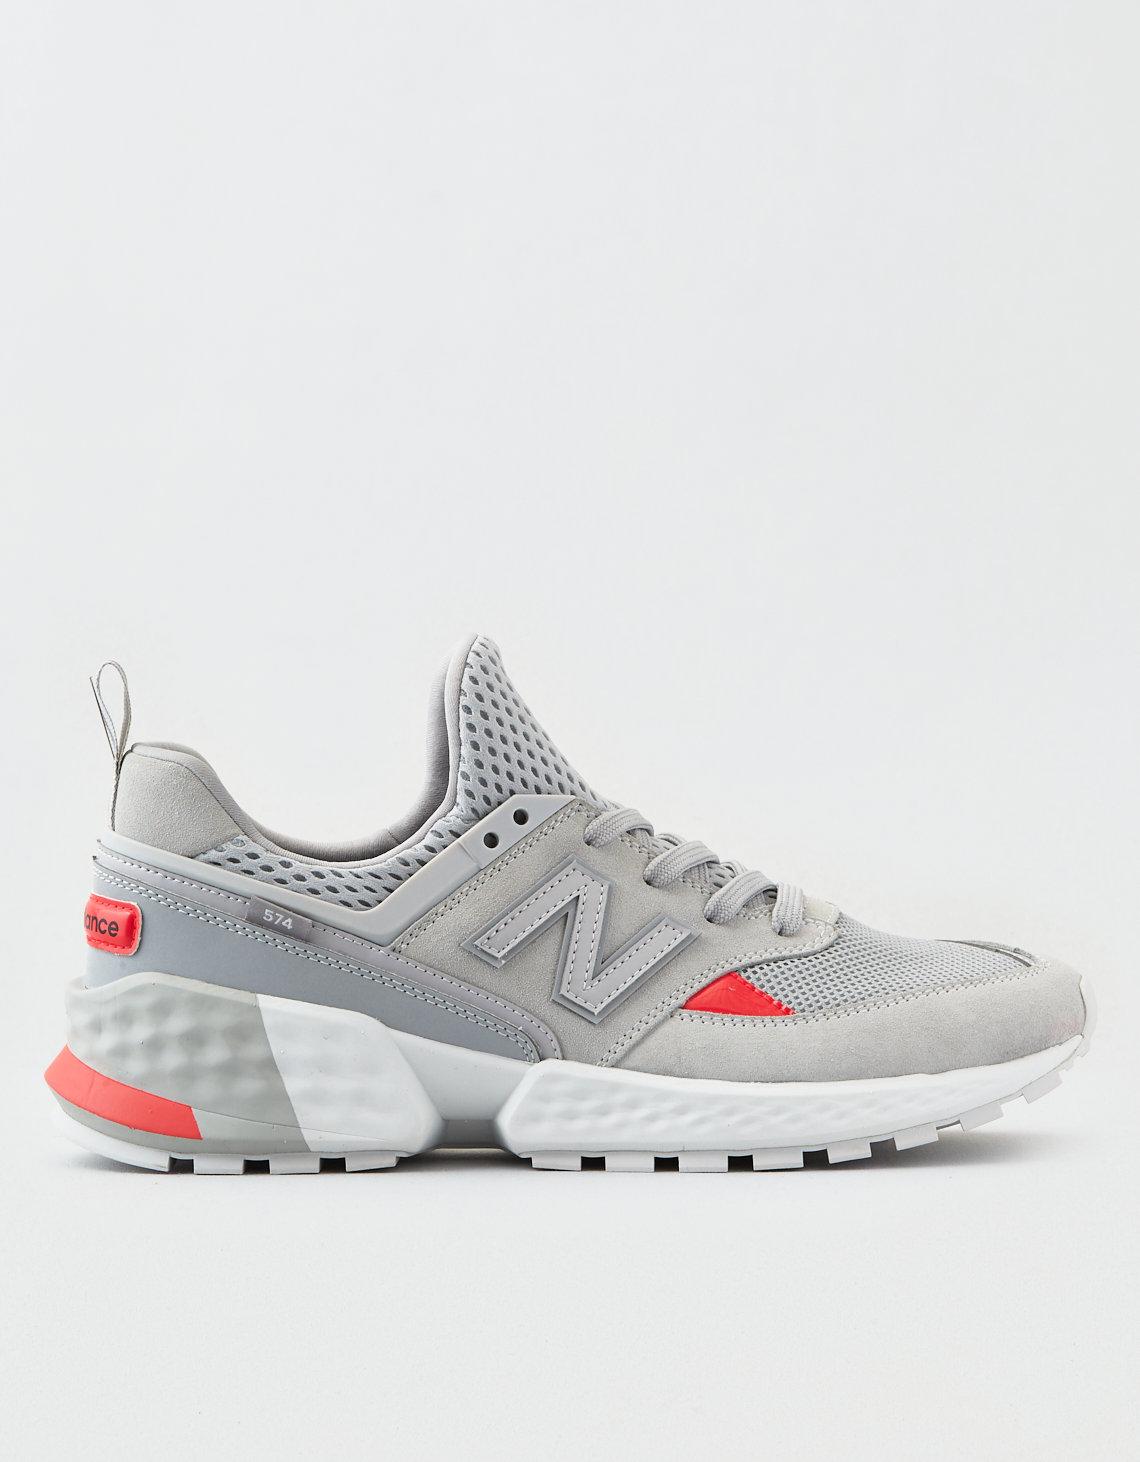 new product 629b4 67403 New Balance 574 Sport Sneaker